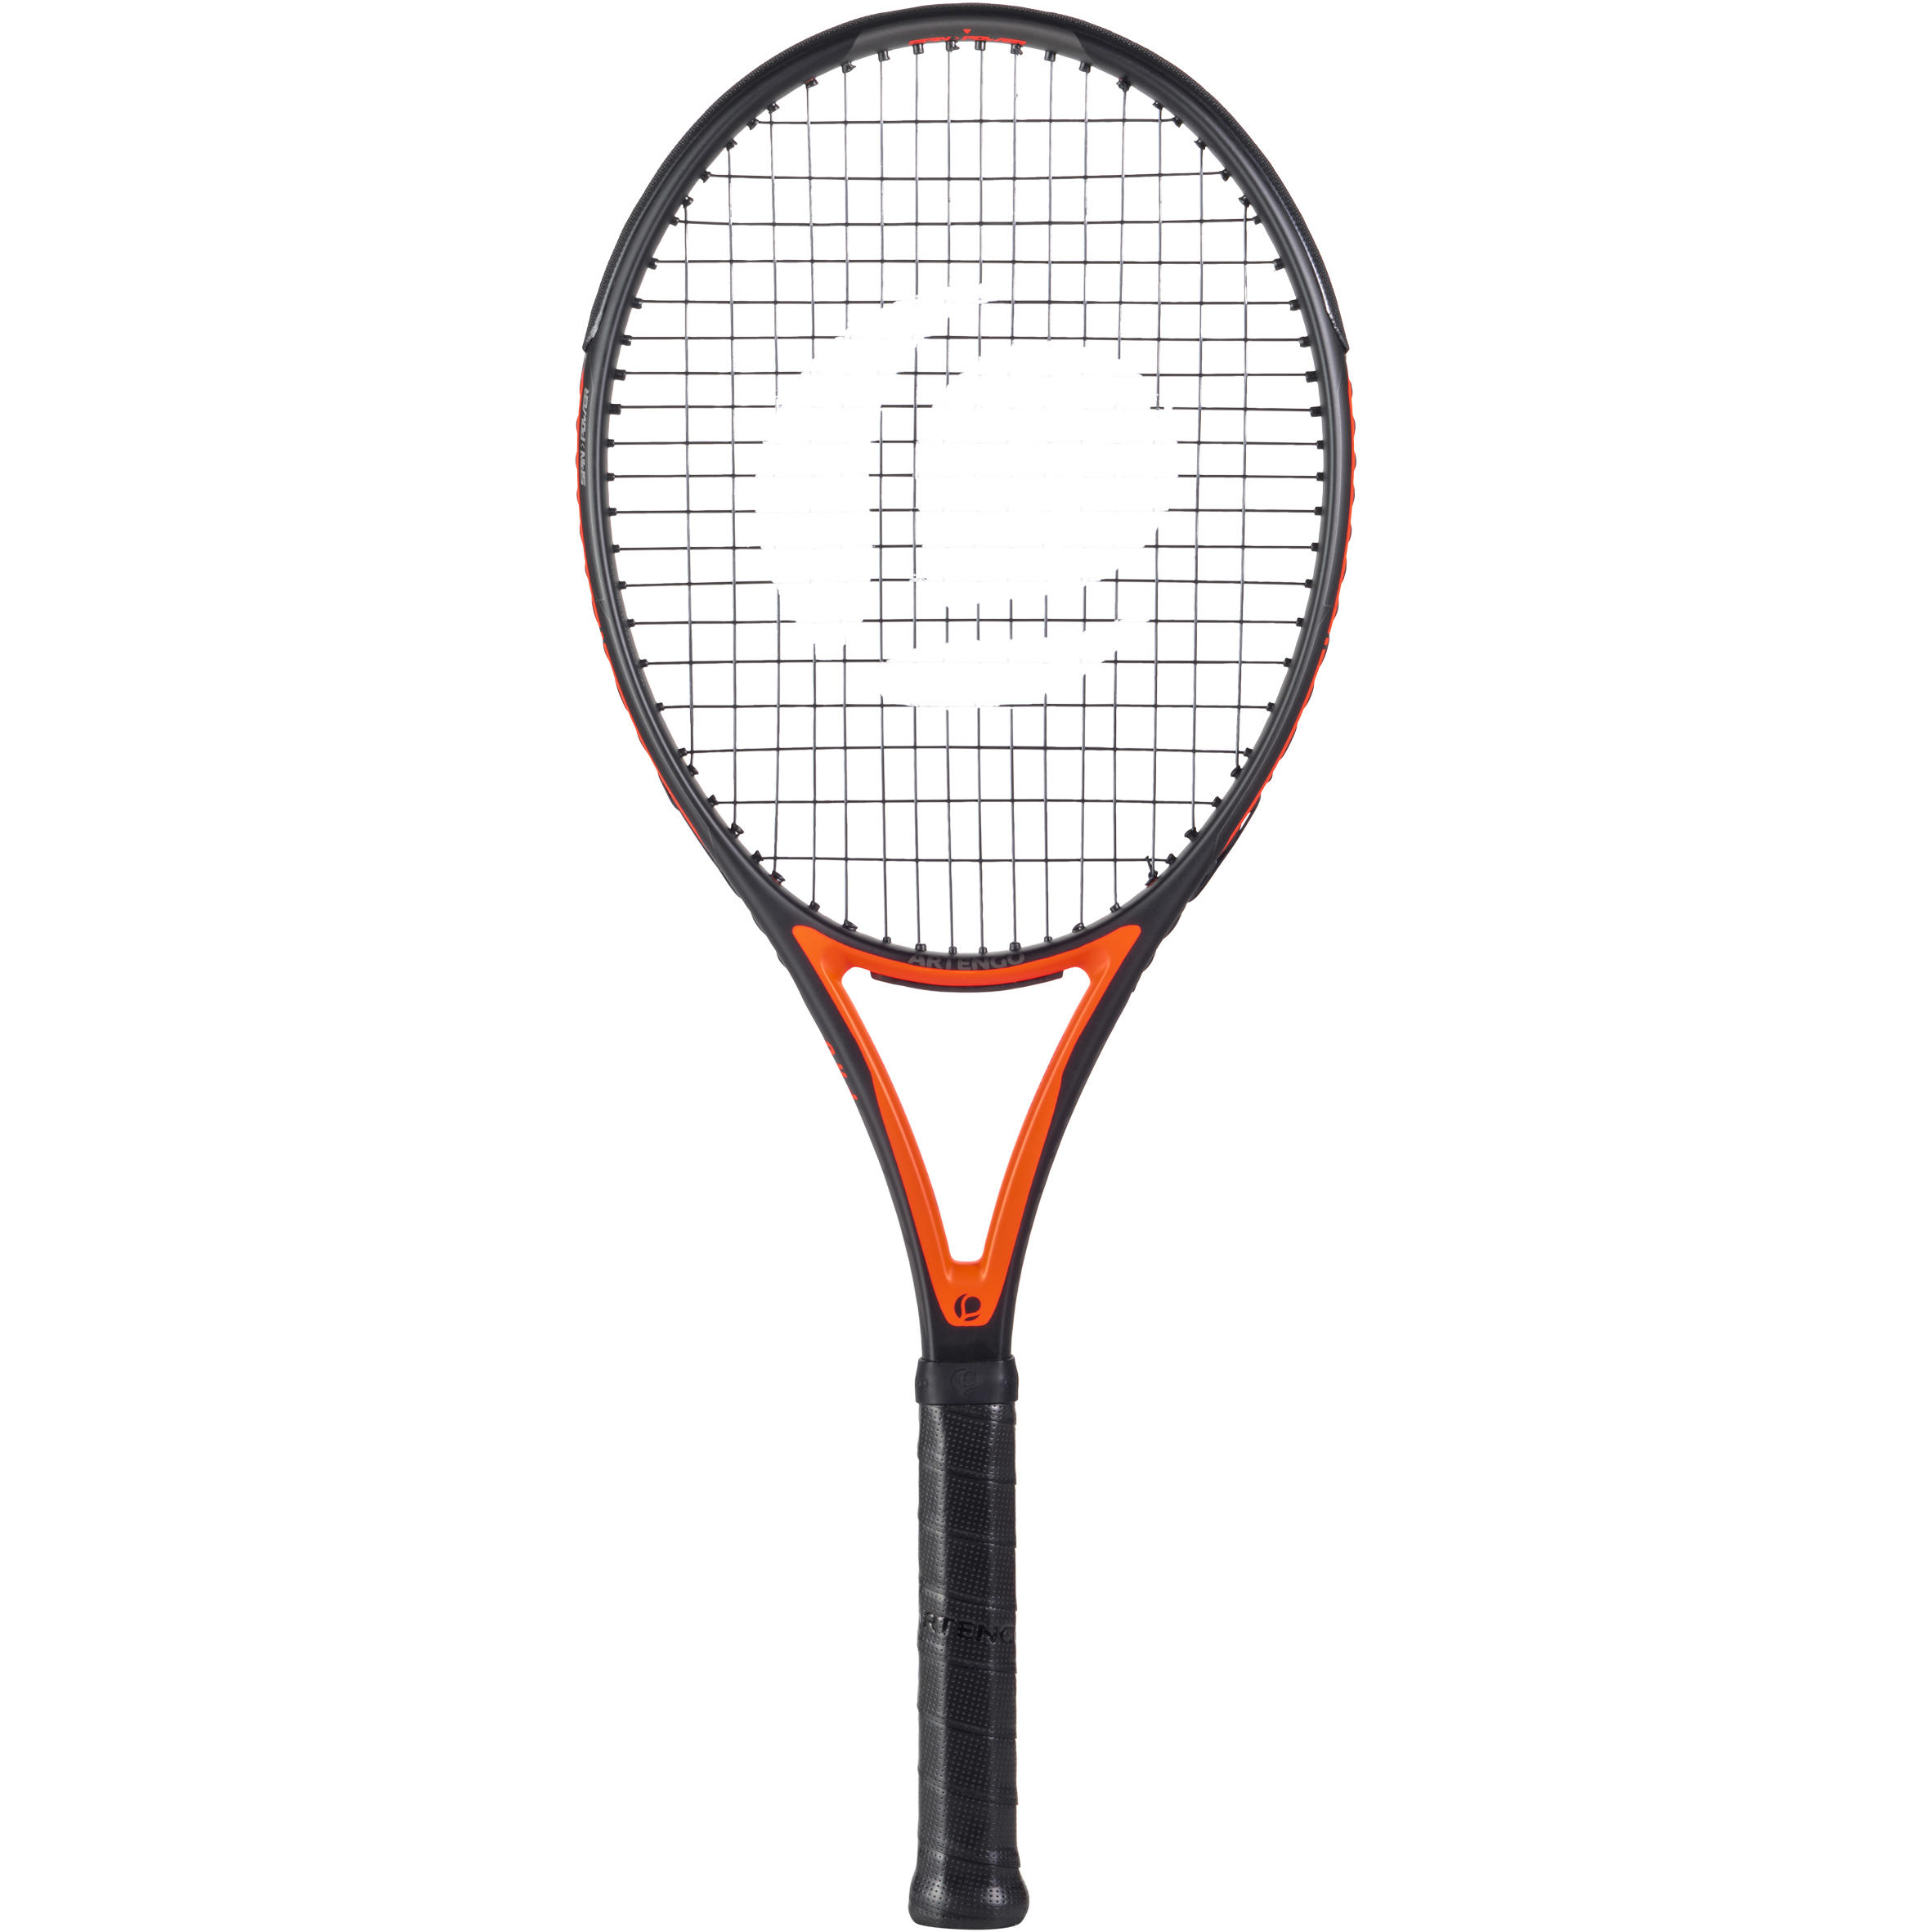 tennisracket kopen? decathlon nltennisracket volwassene tr 990 pro zwart oranje